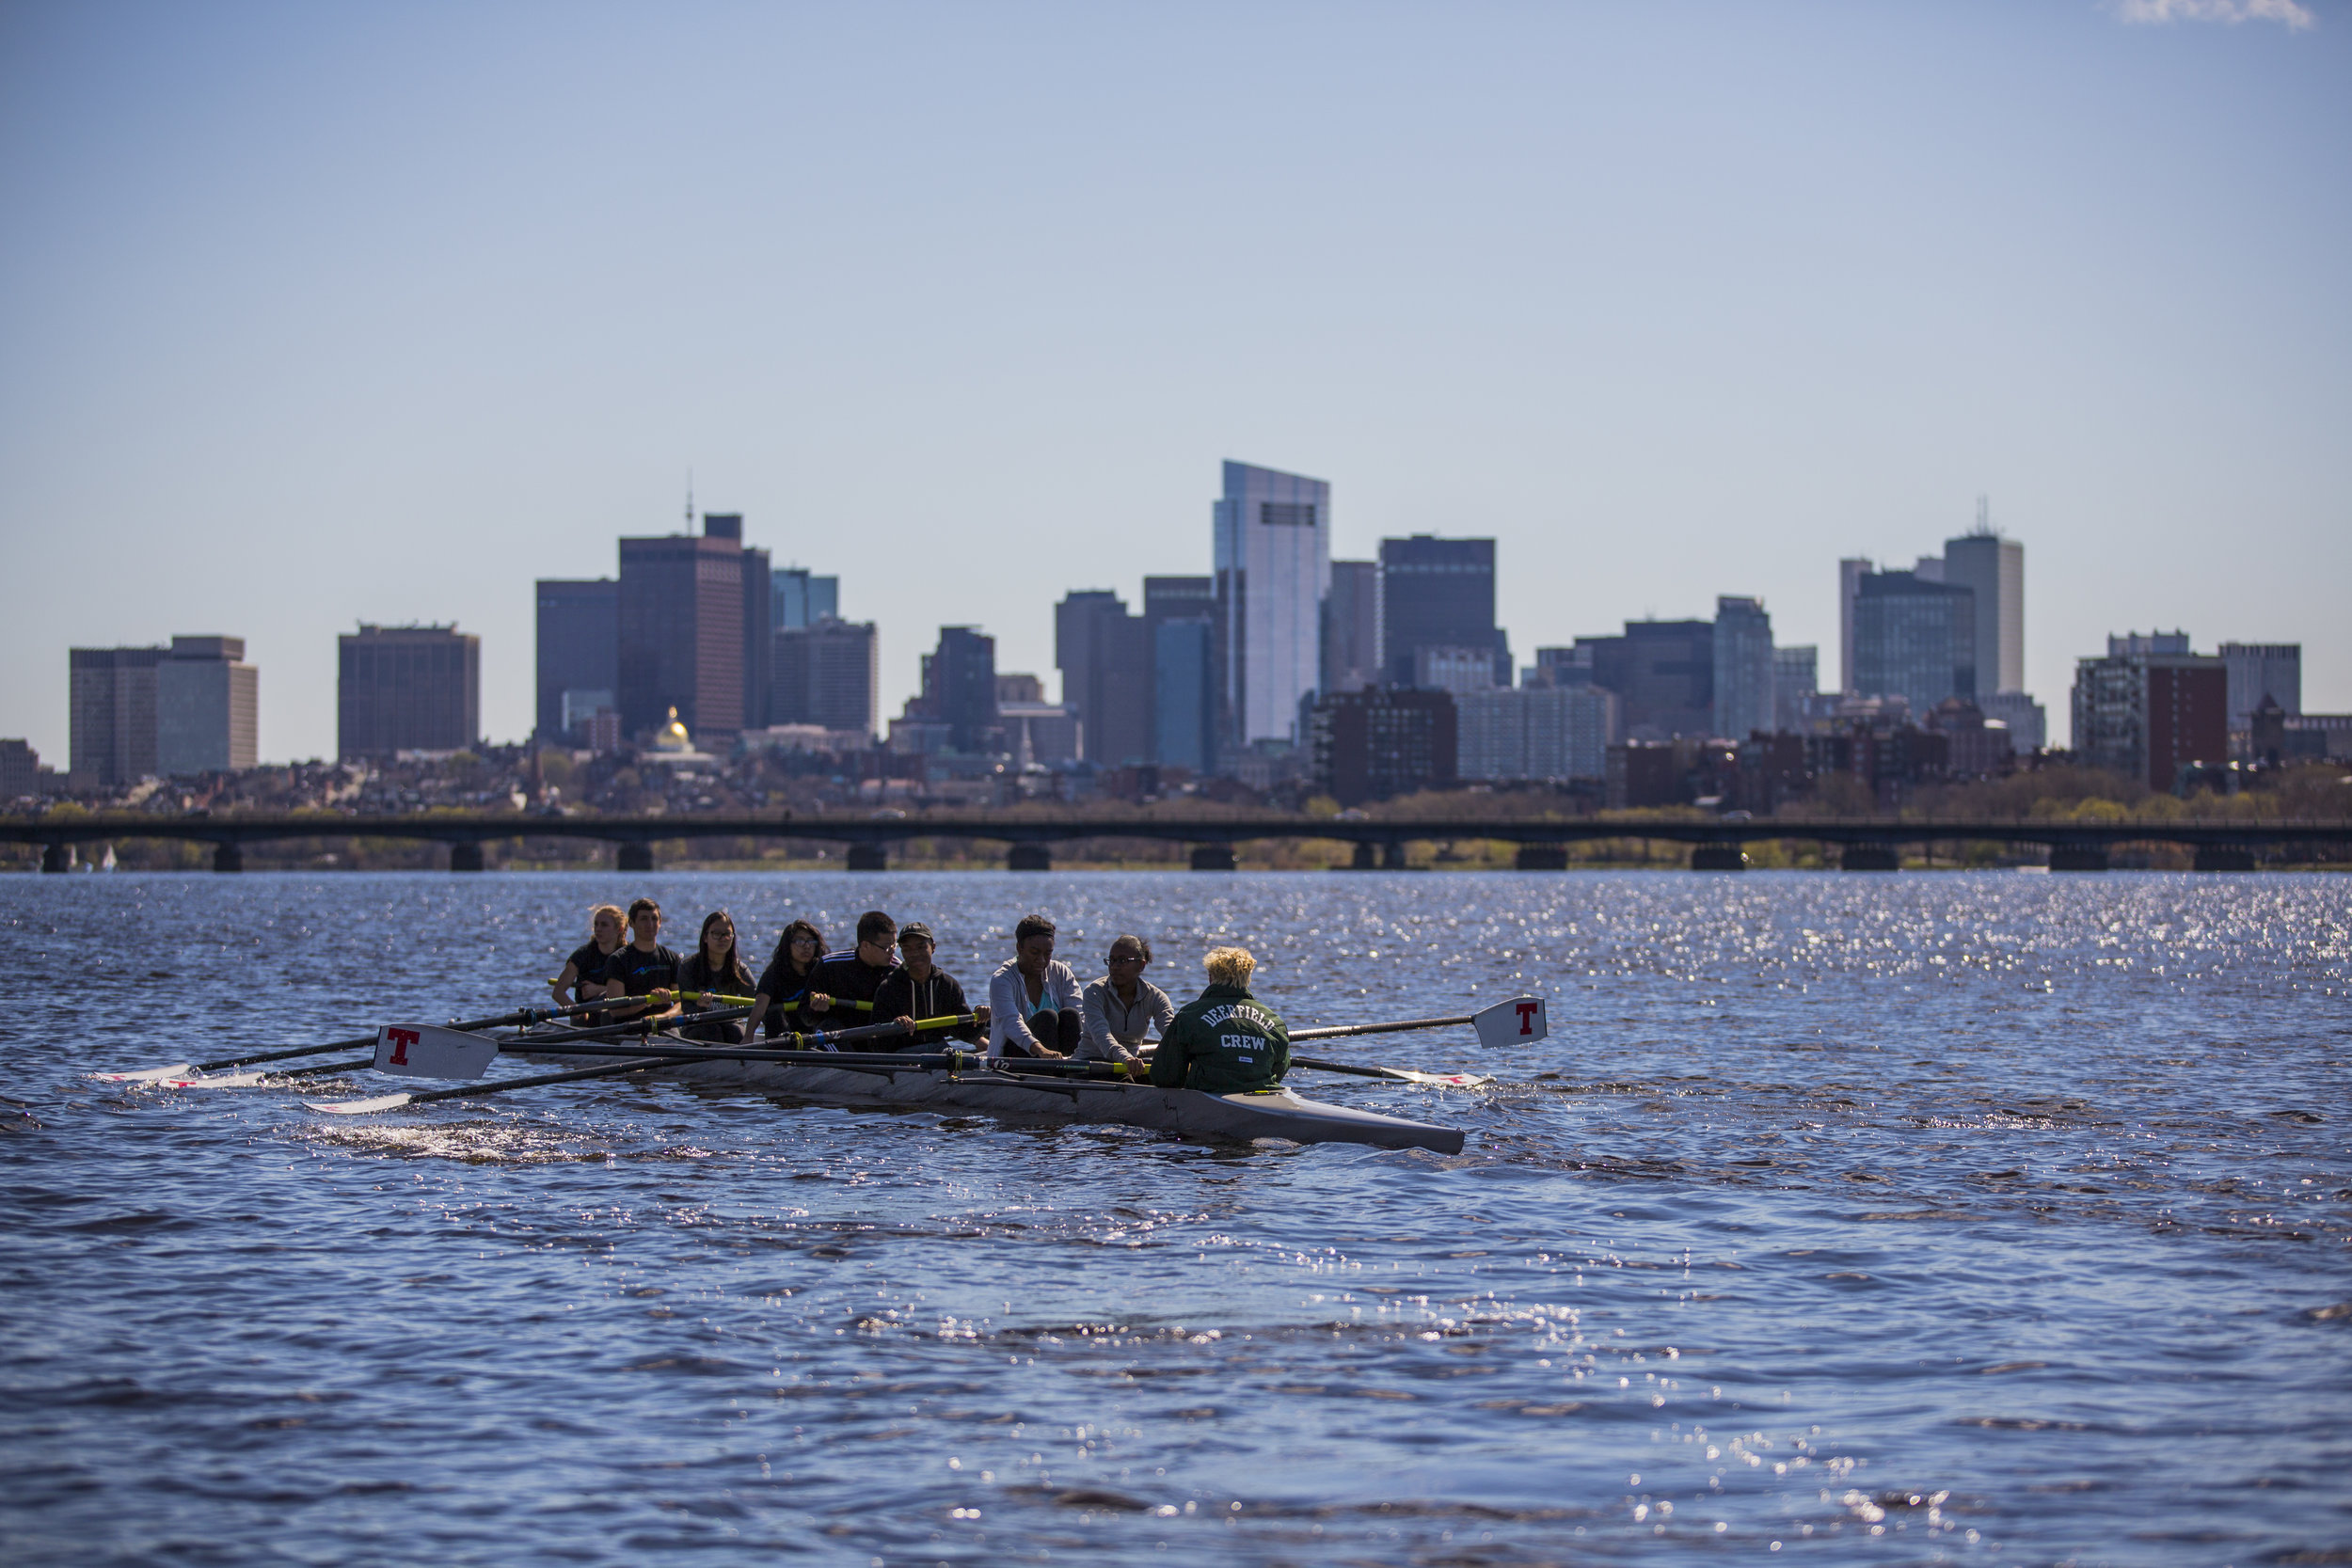 We row.